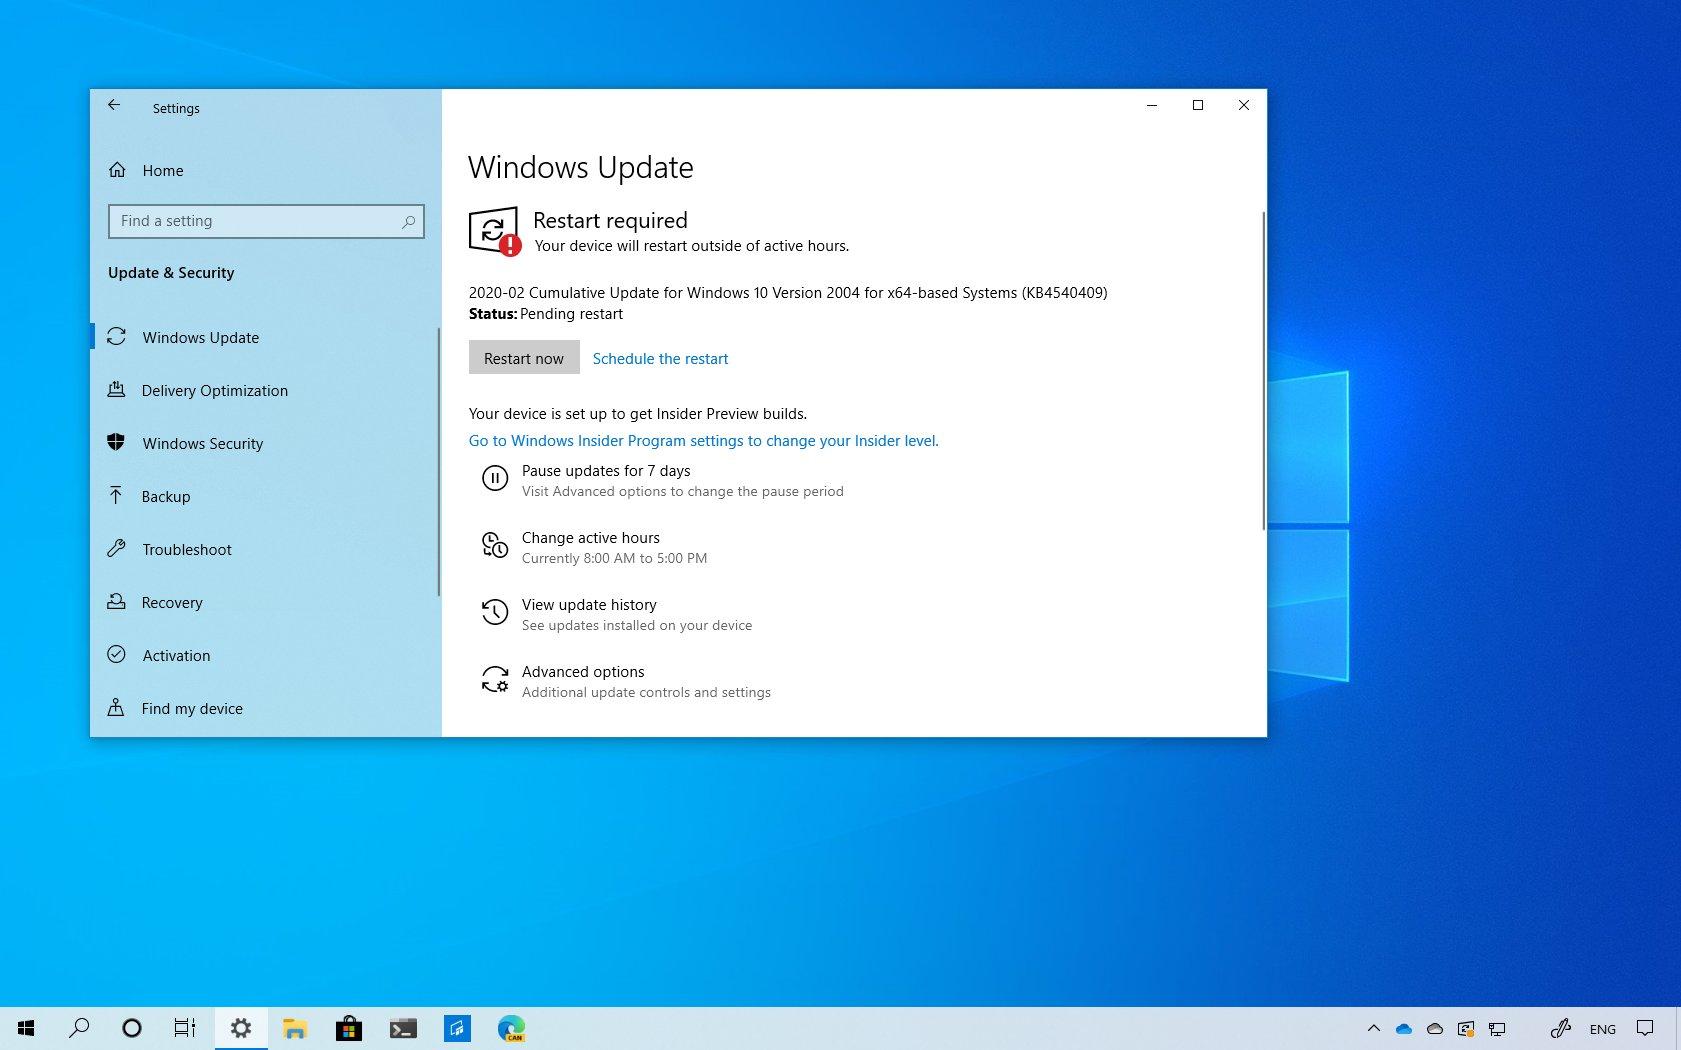 Windows 10 update KB4540409